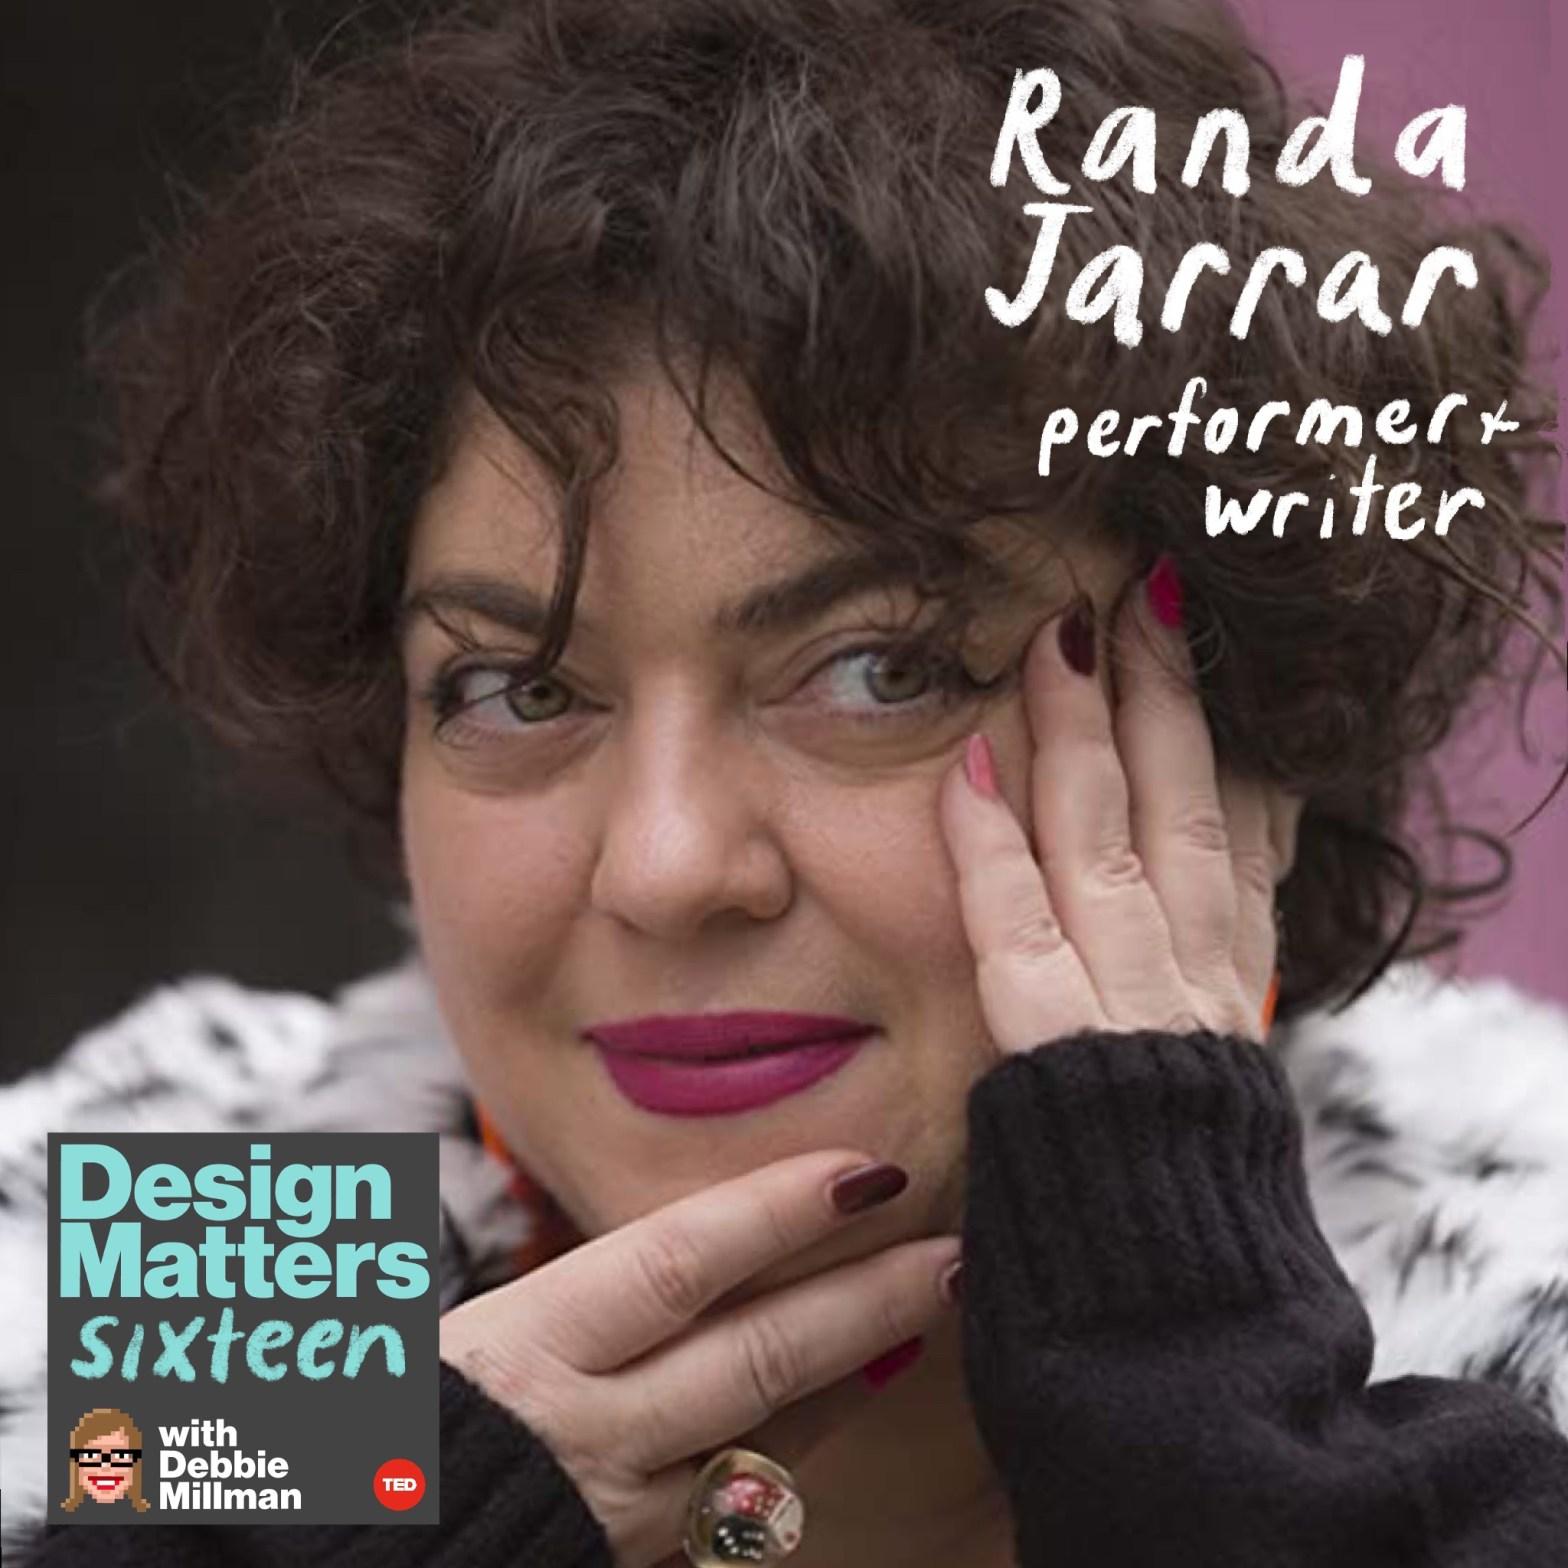 Thumbnail for Design Matters: Randa Jarrar